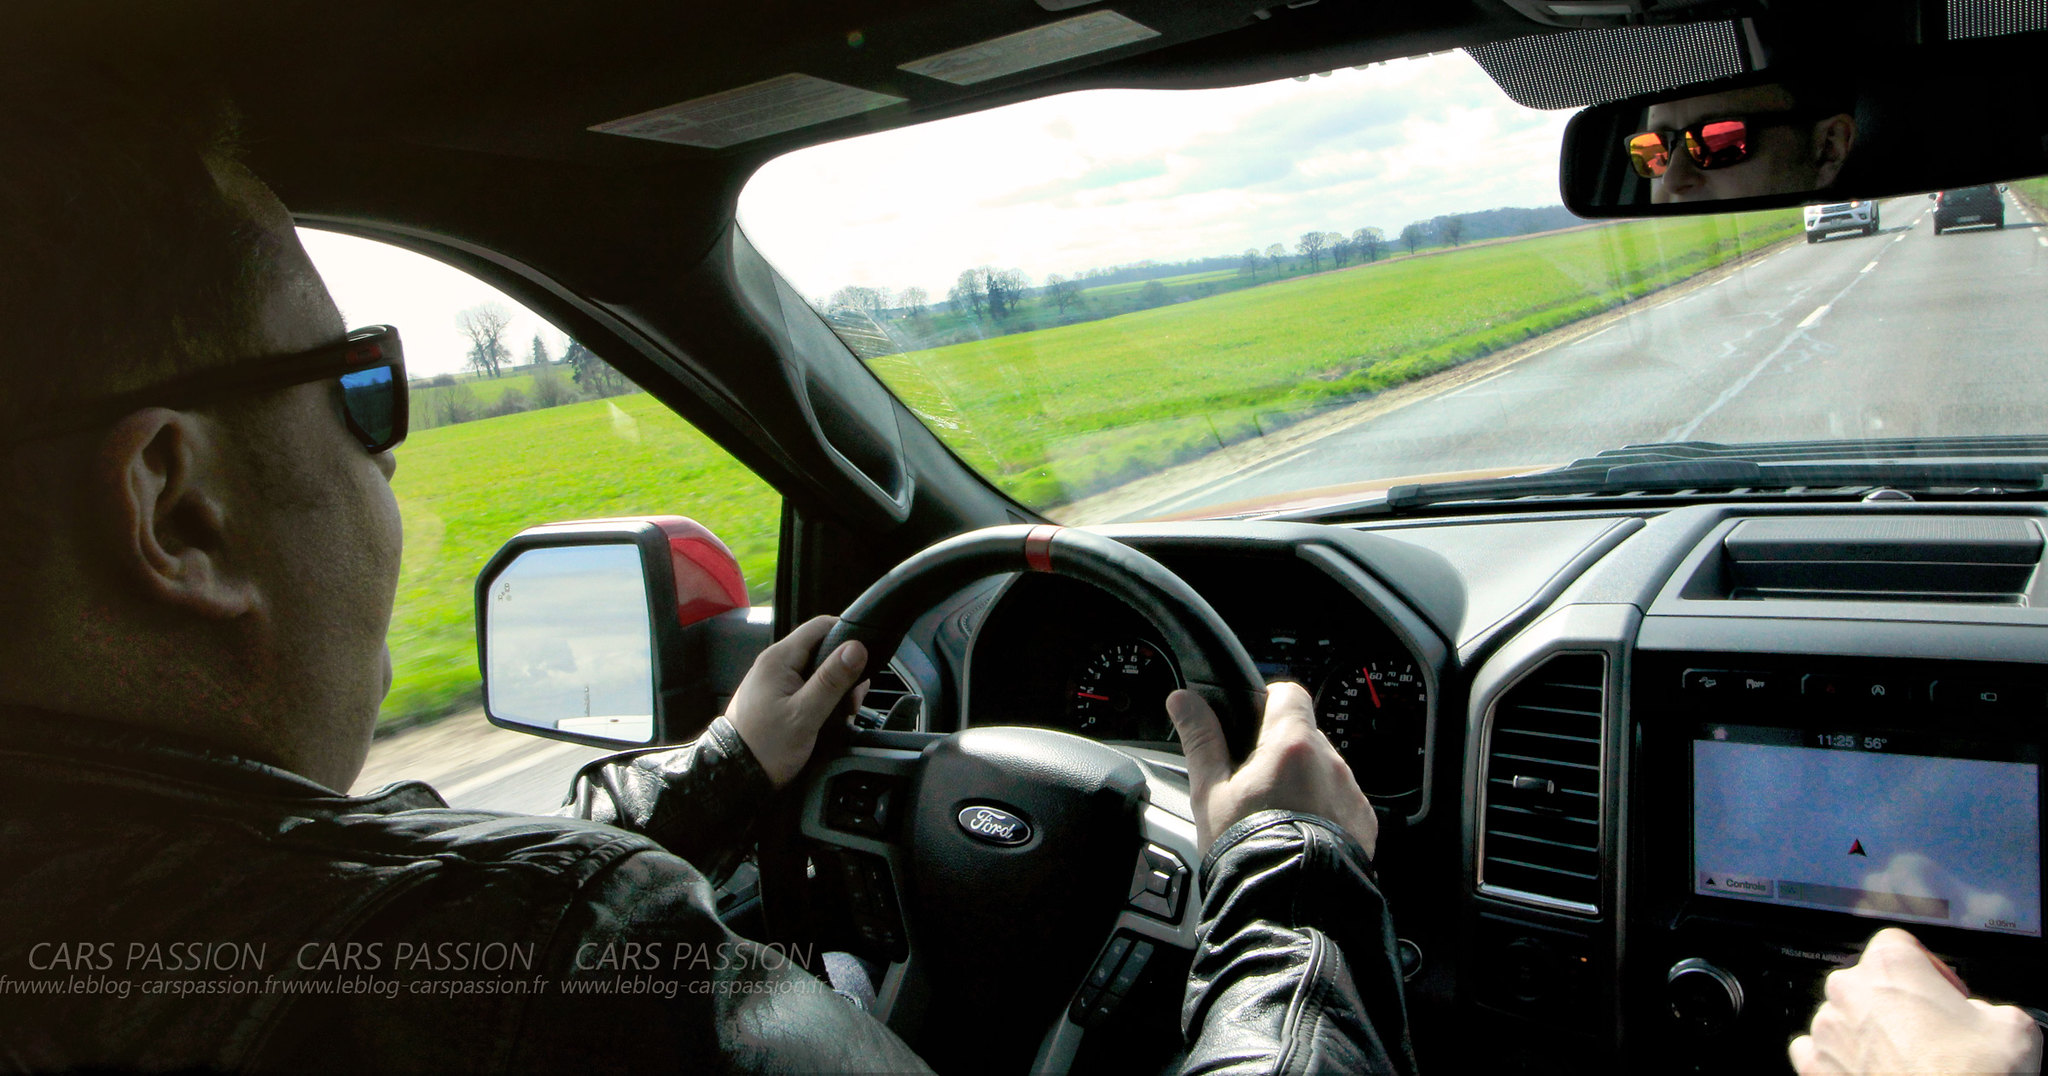 Essai du Ford Raptor F150 avec American Car City